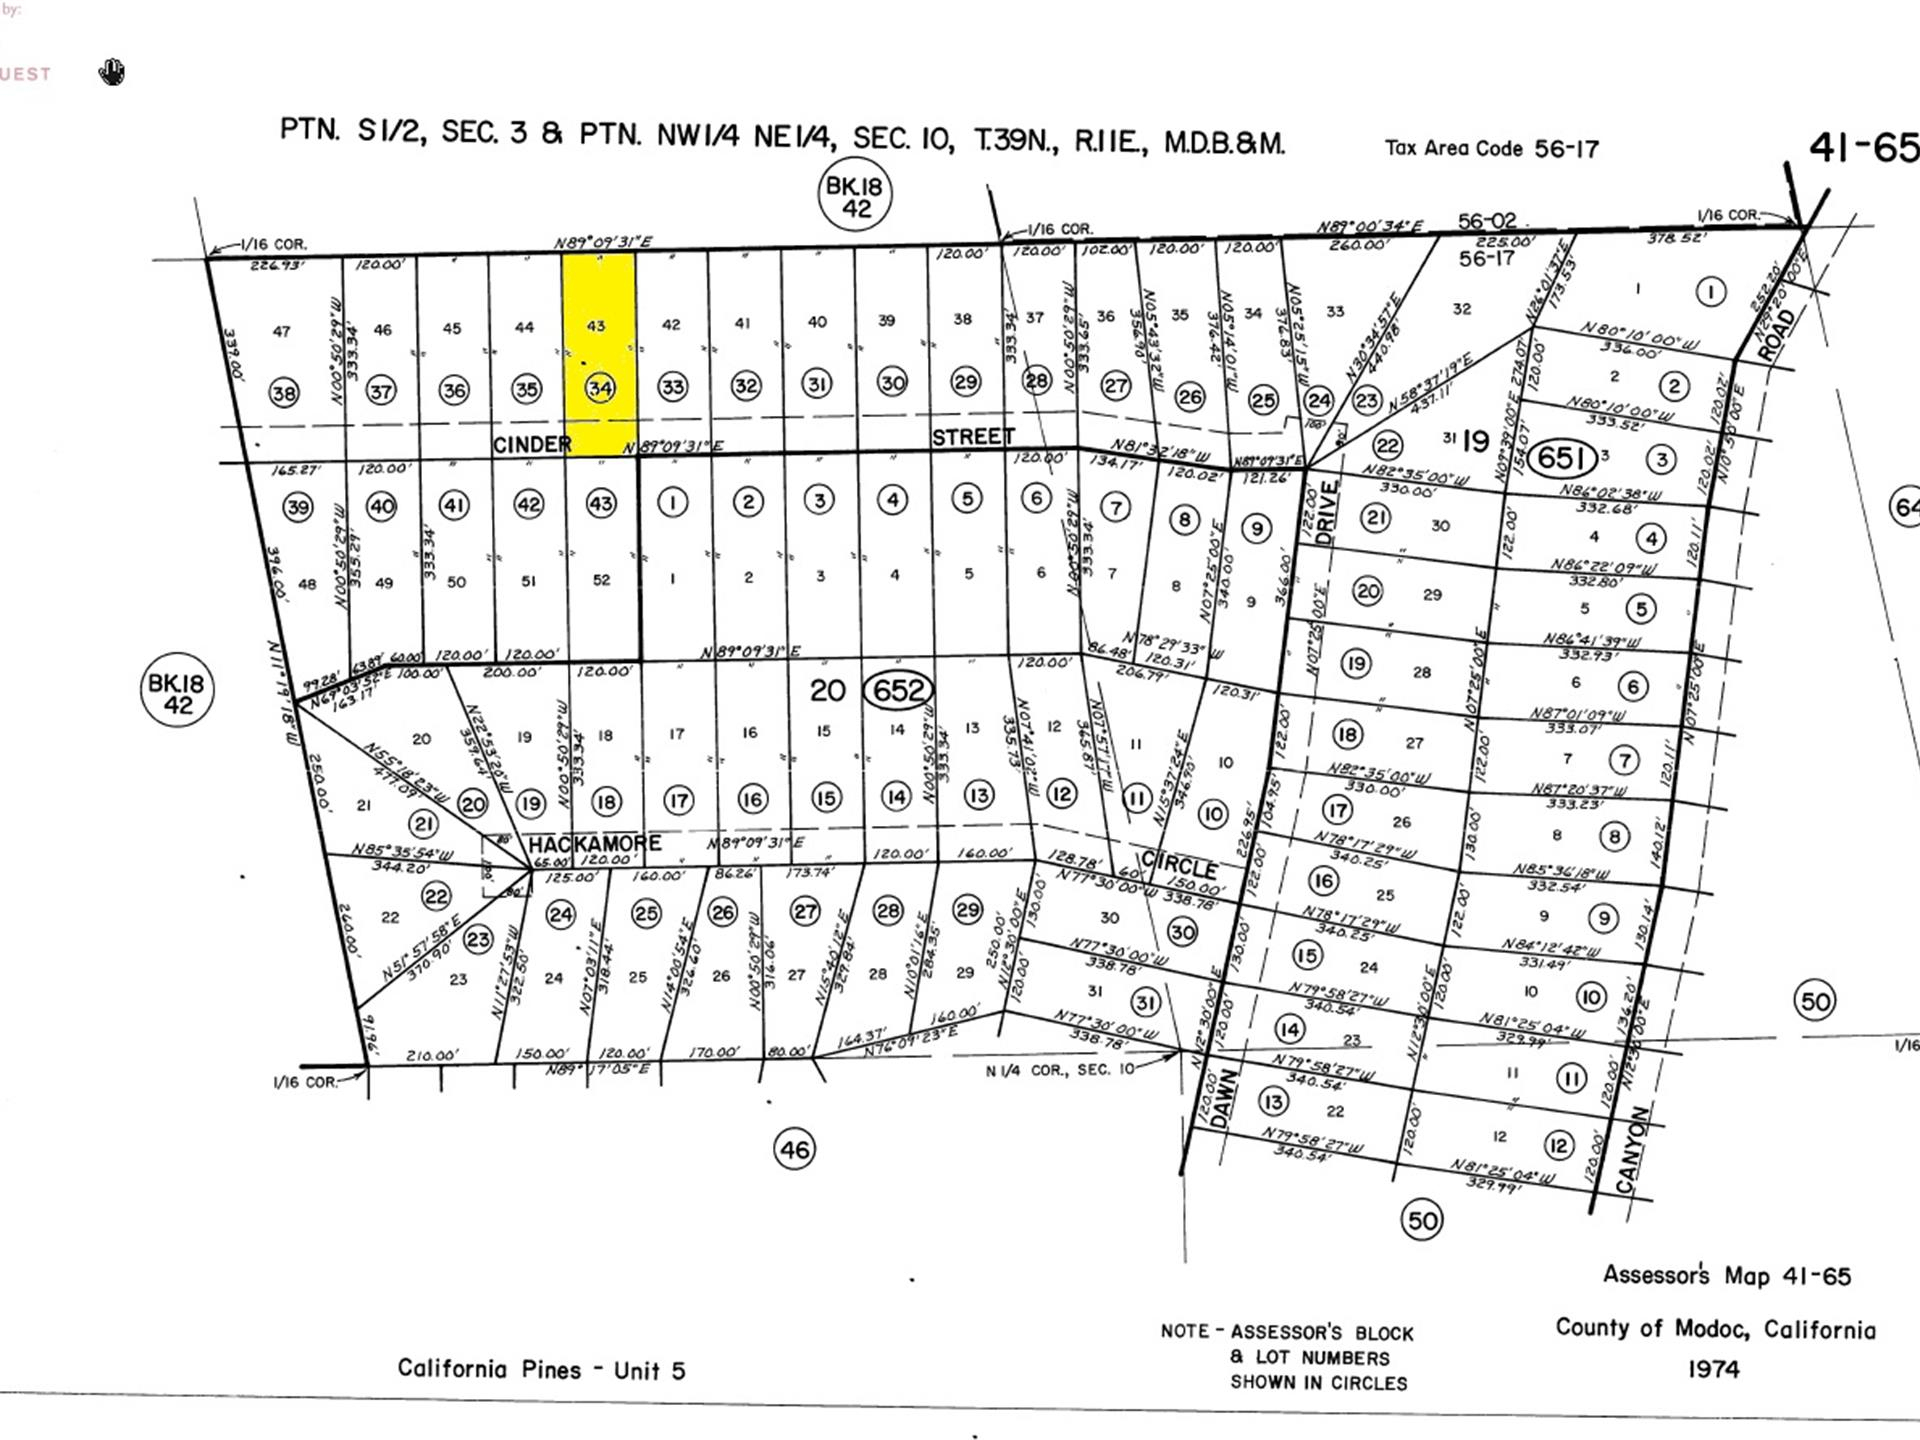 California Pines Lot In Modoc, Ca : Land For Saleowner : Alturas - California Pines Parcel Map